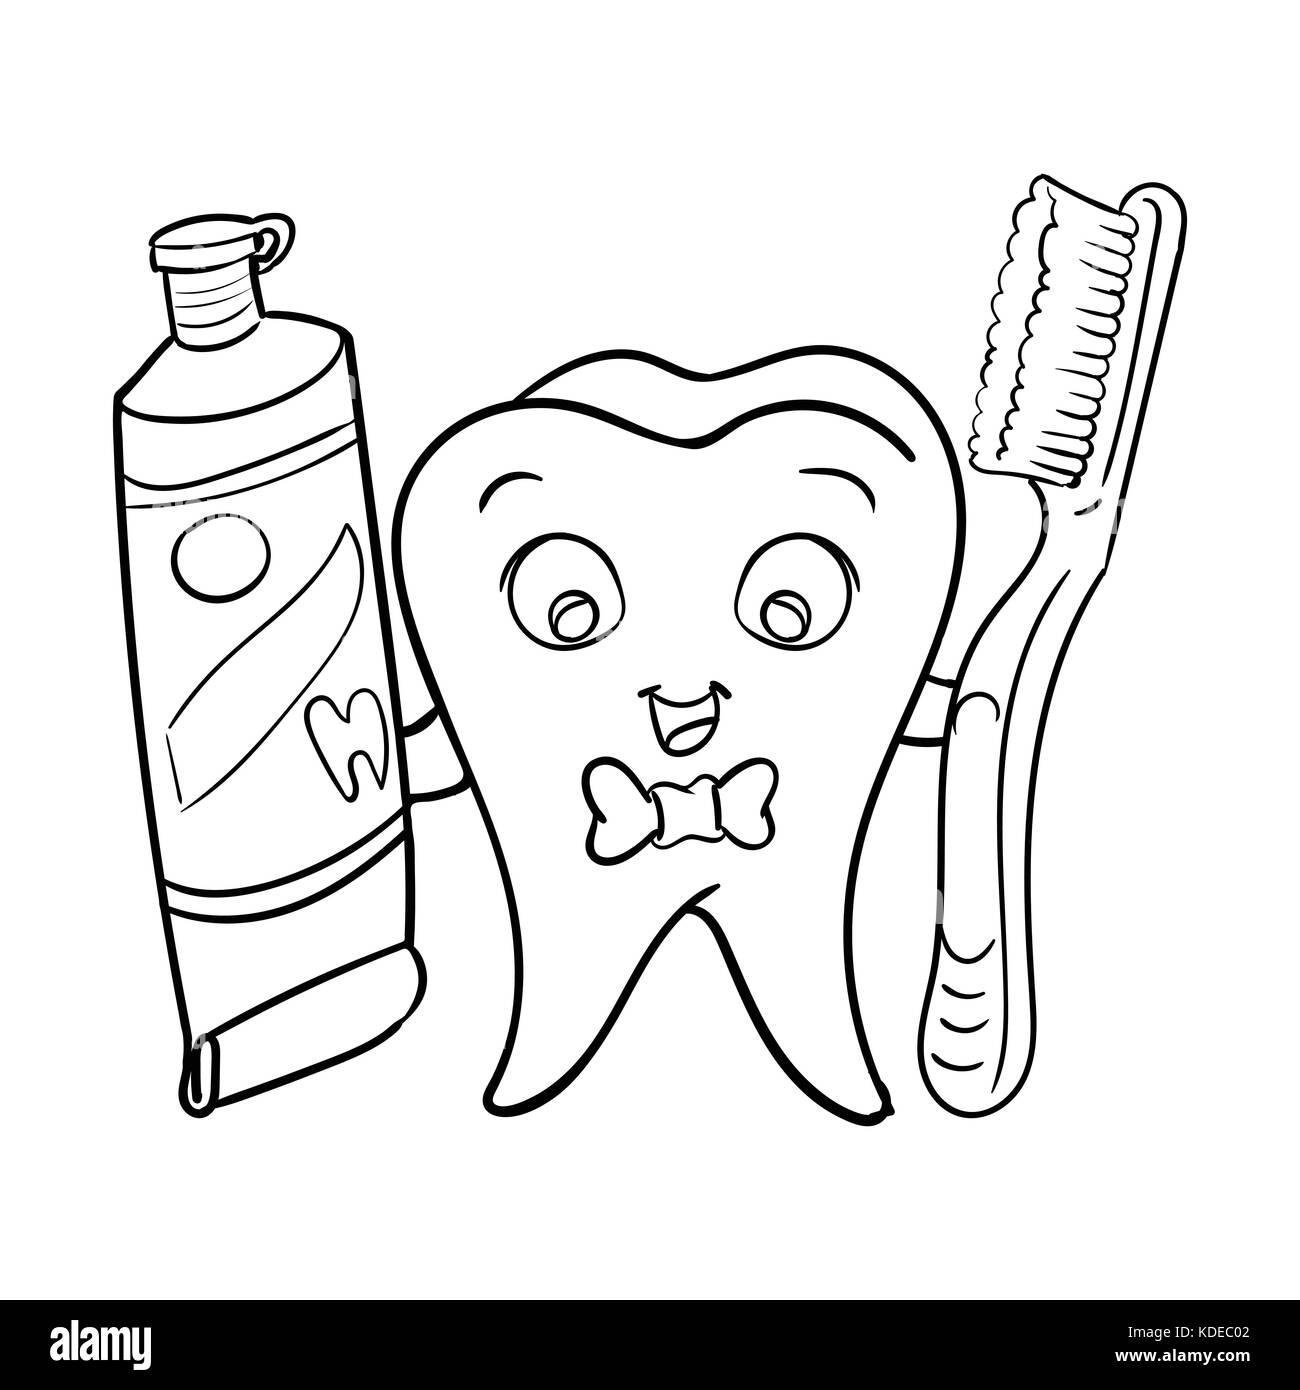 dentist black and white stock photos u0026 images alamy